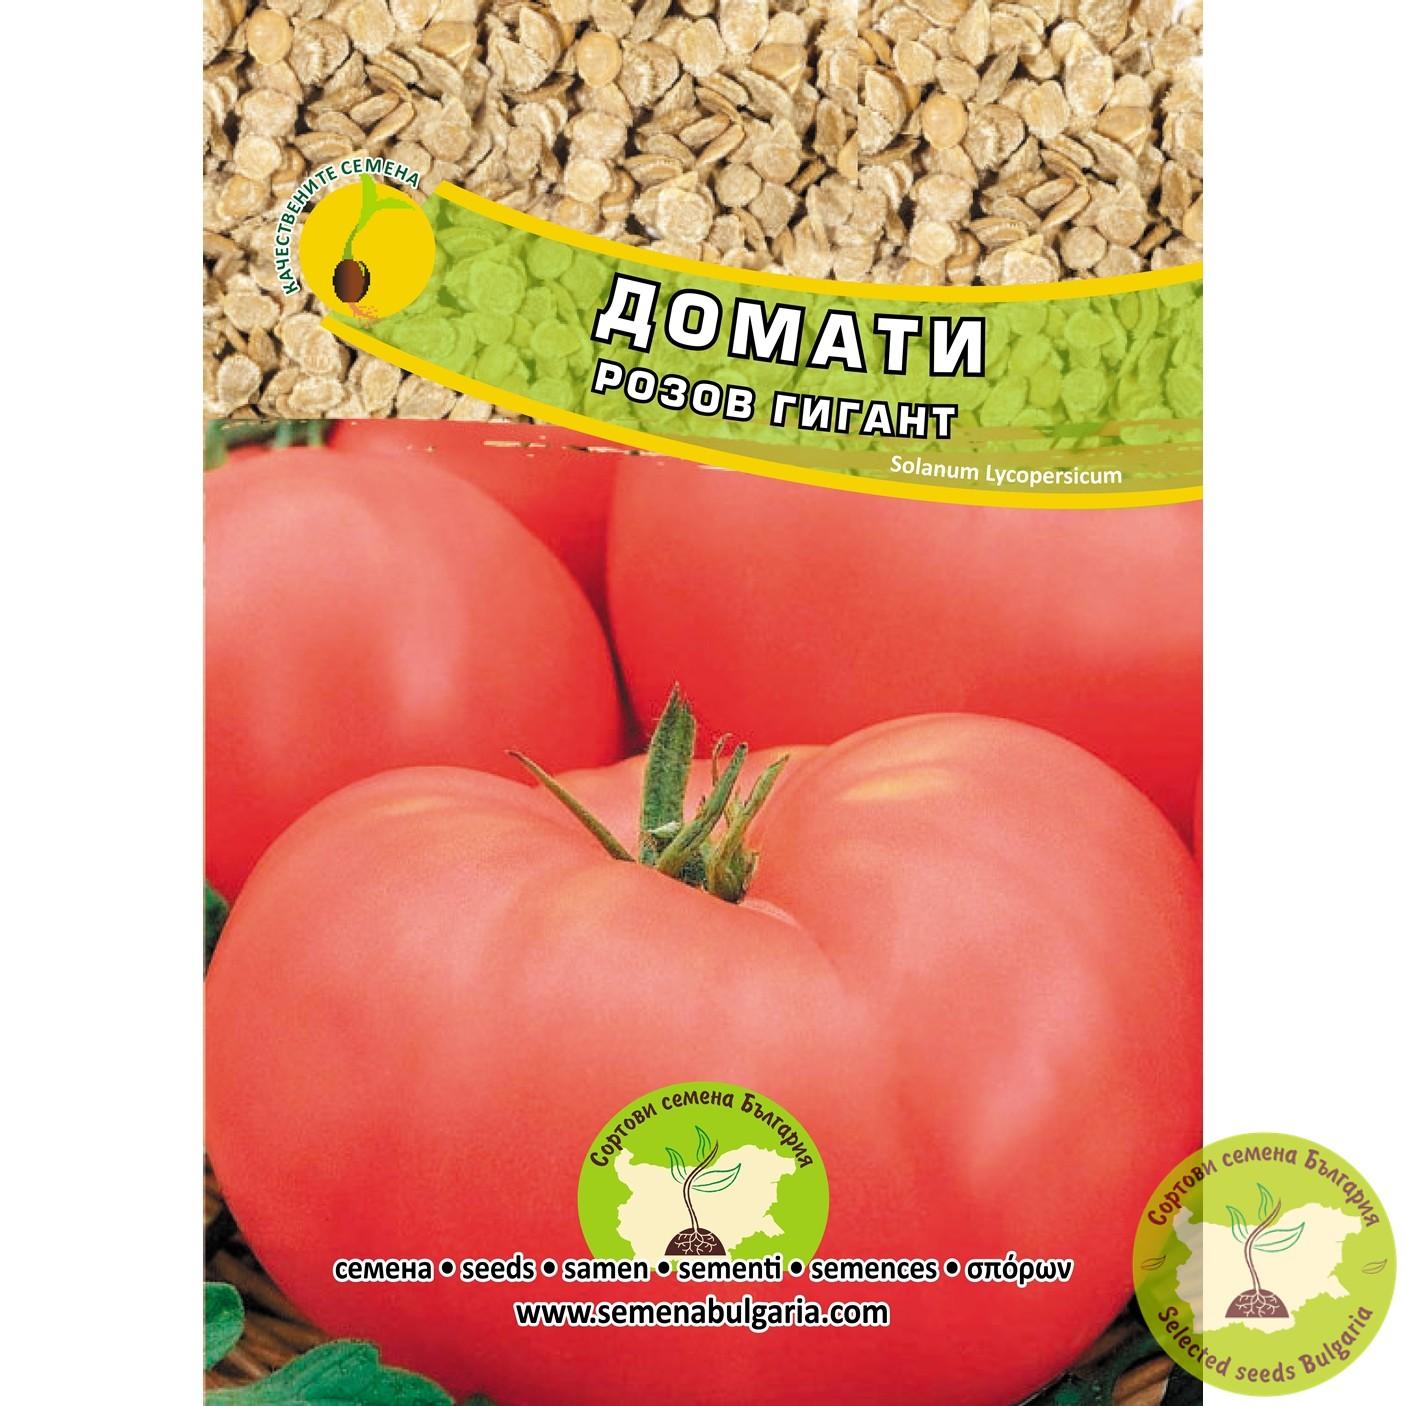 Семена домати Розов гигант